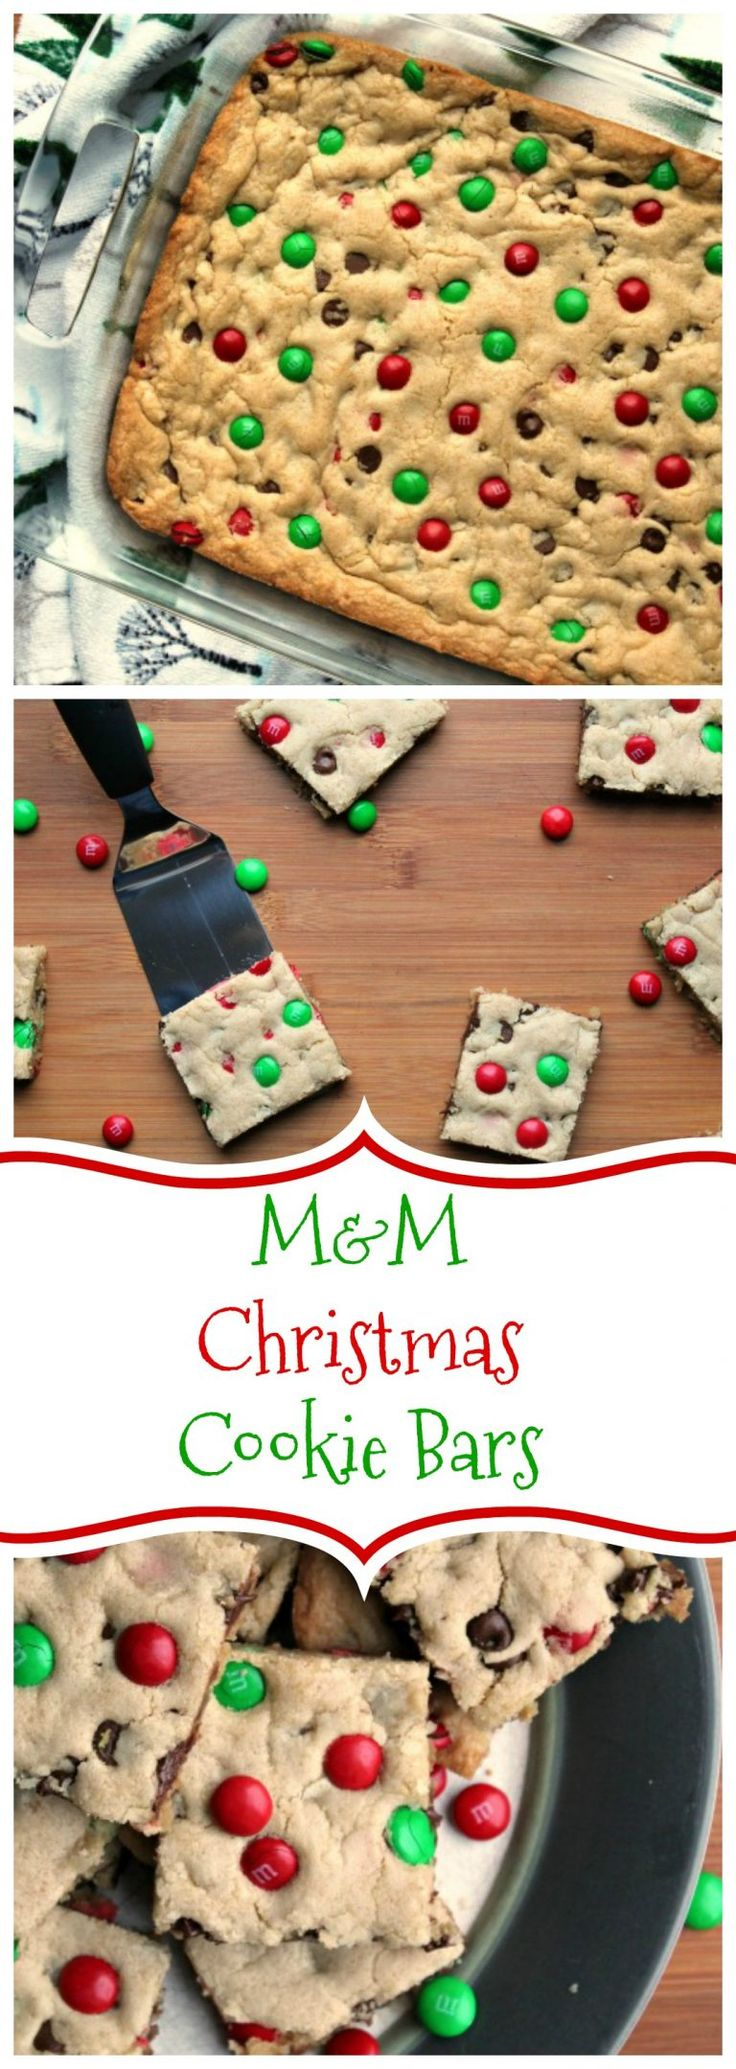 M&M CHRISTMAS COOKIE BARS & salted caramel choc cookie bars